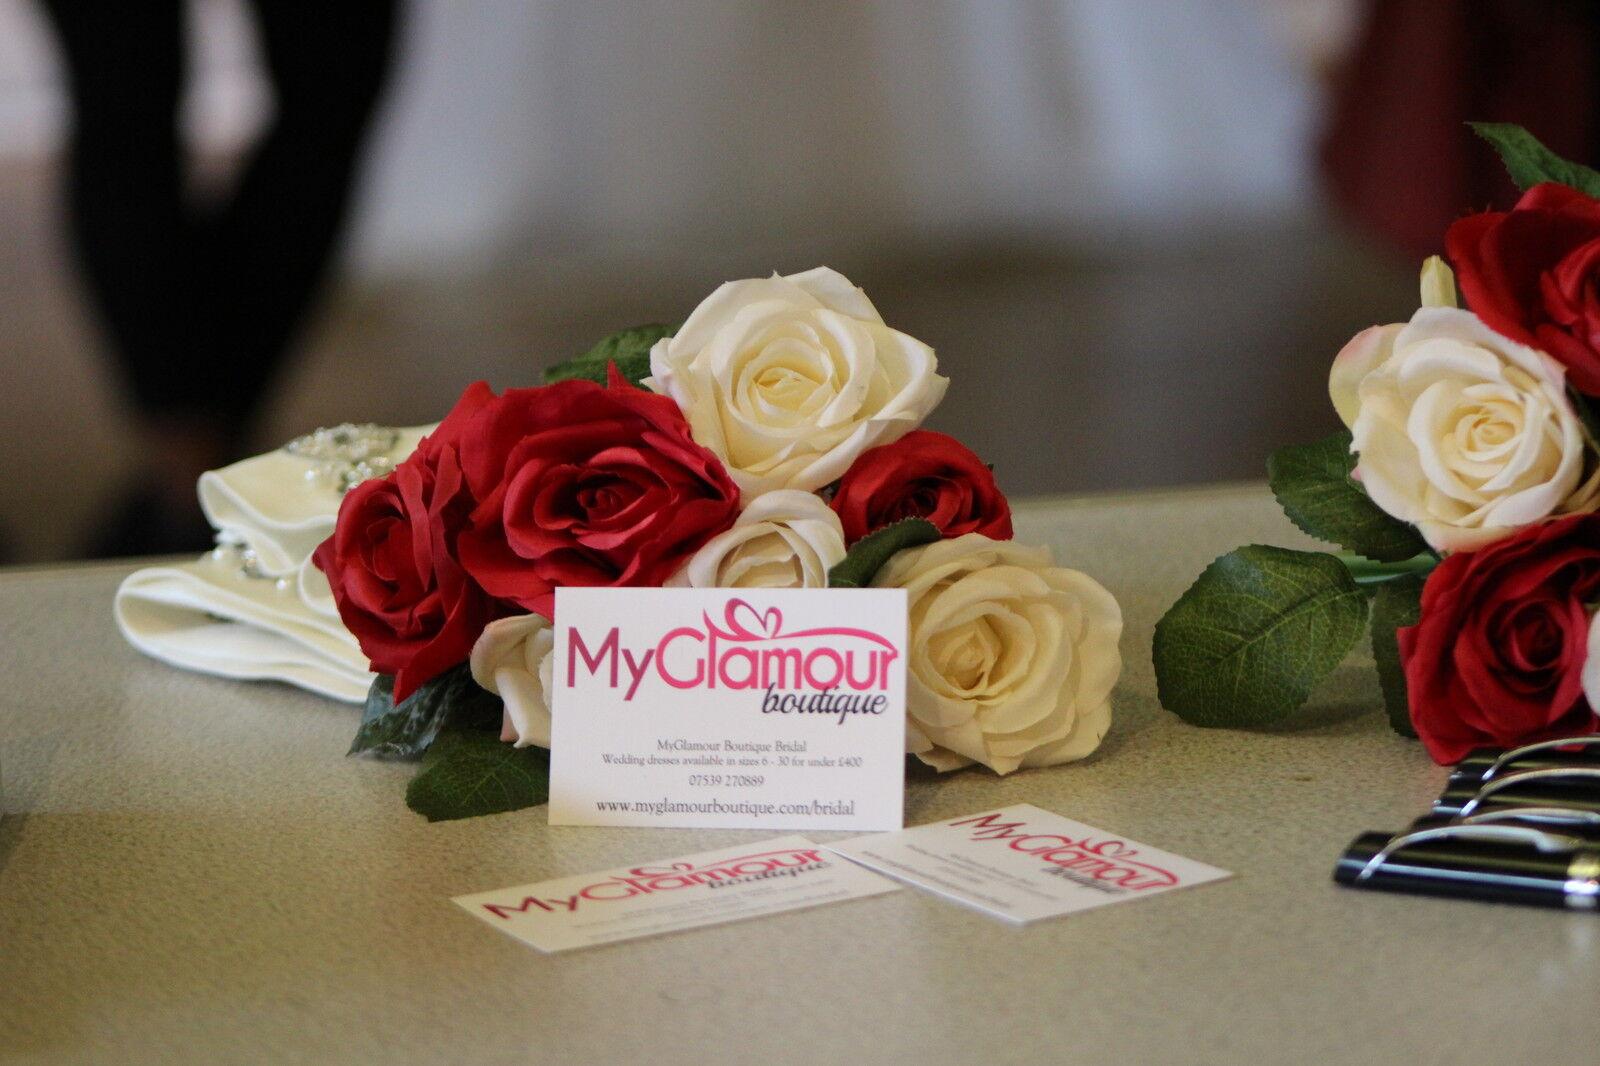 MyGlamour Boutique Bridal